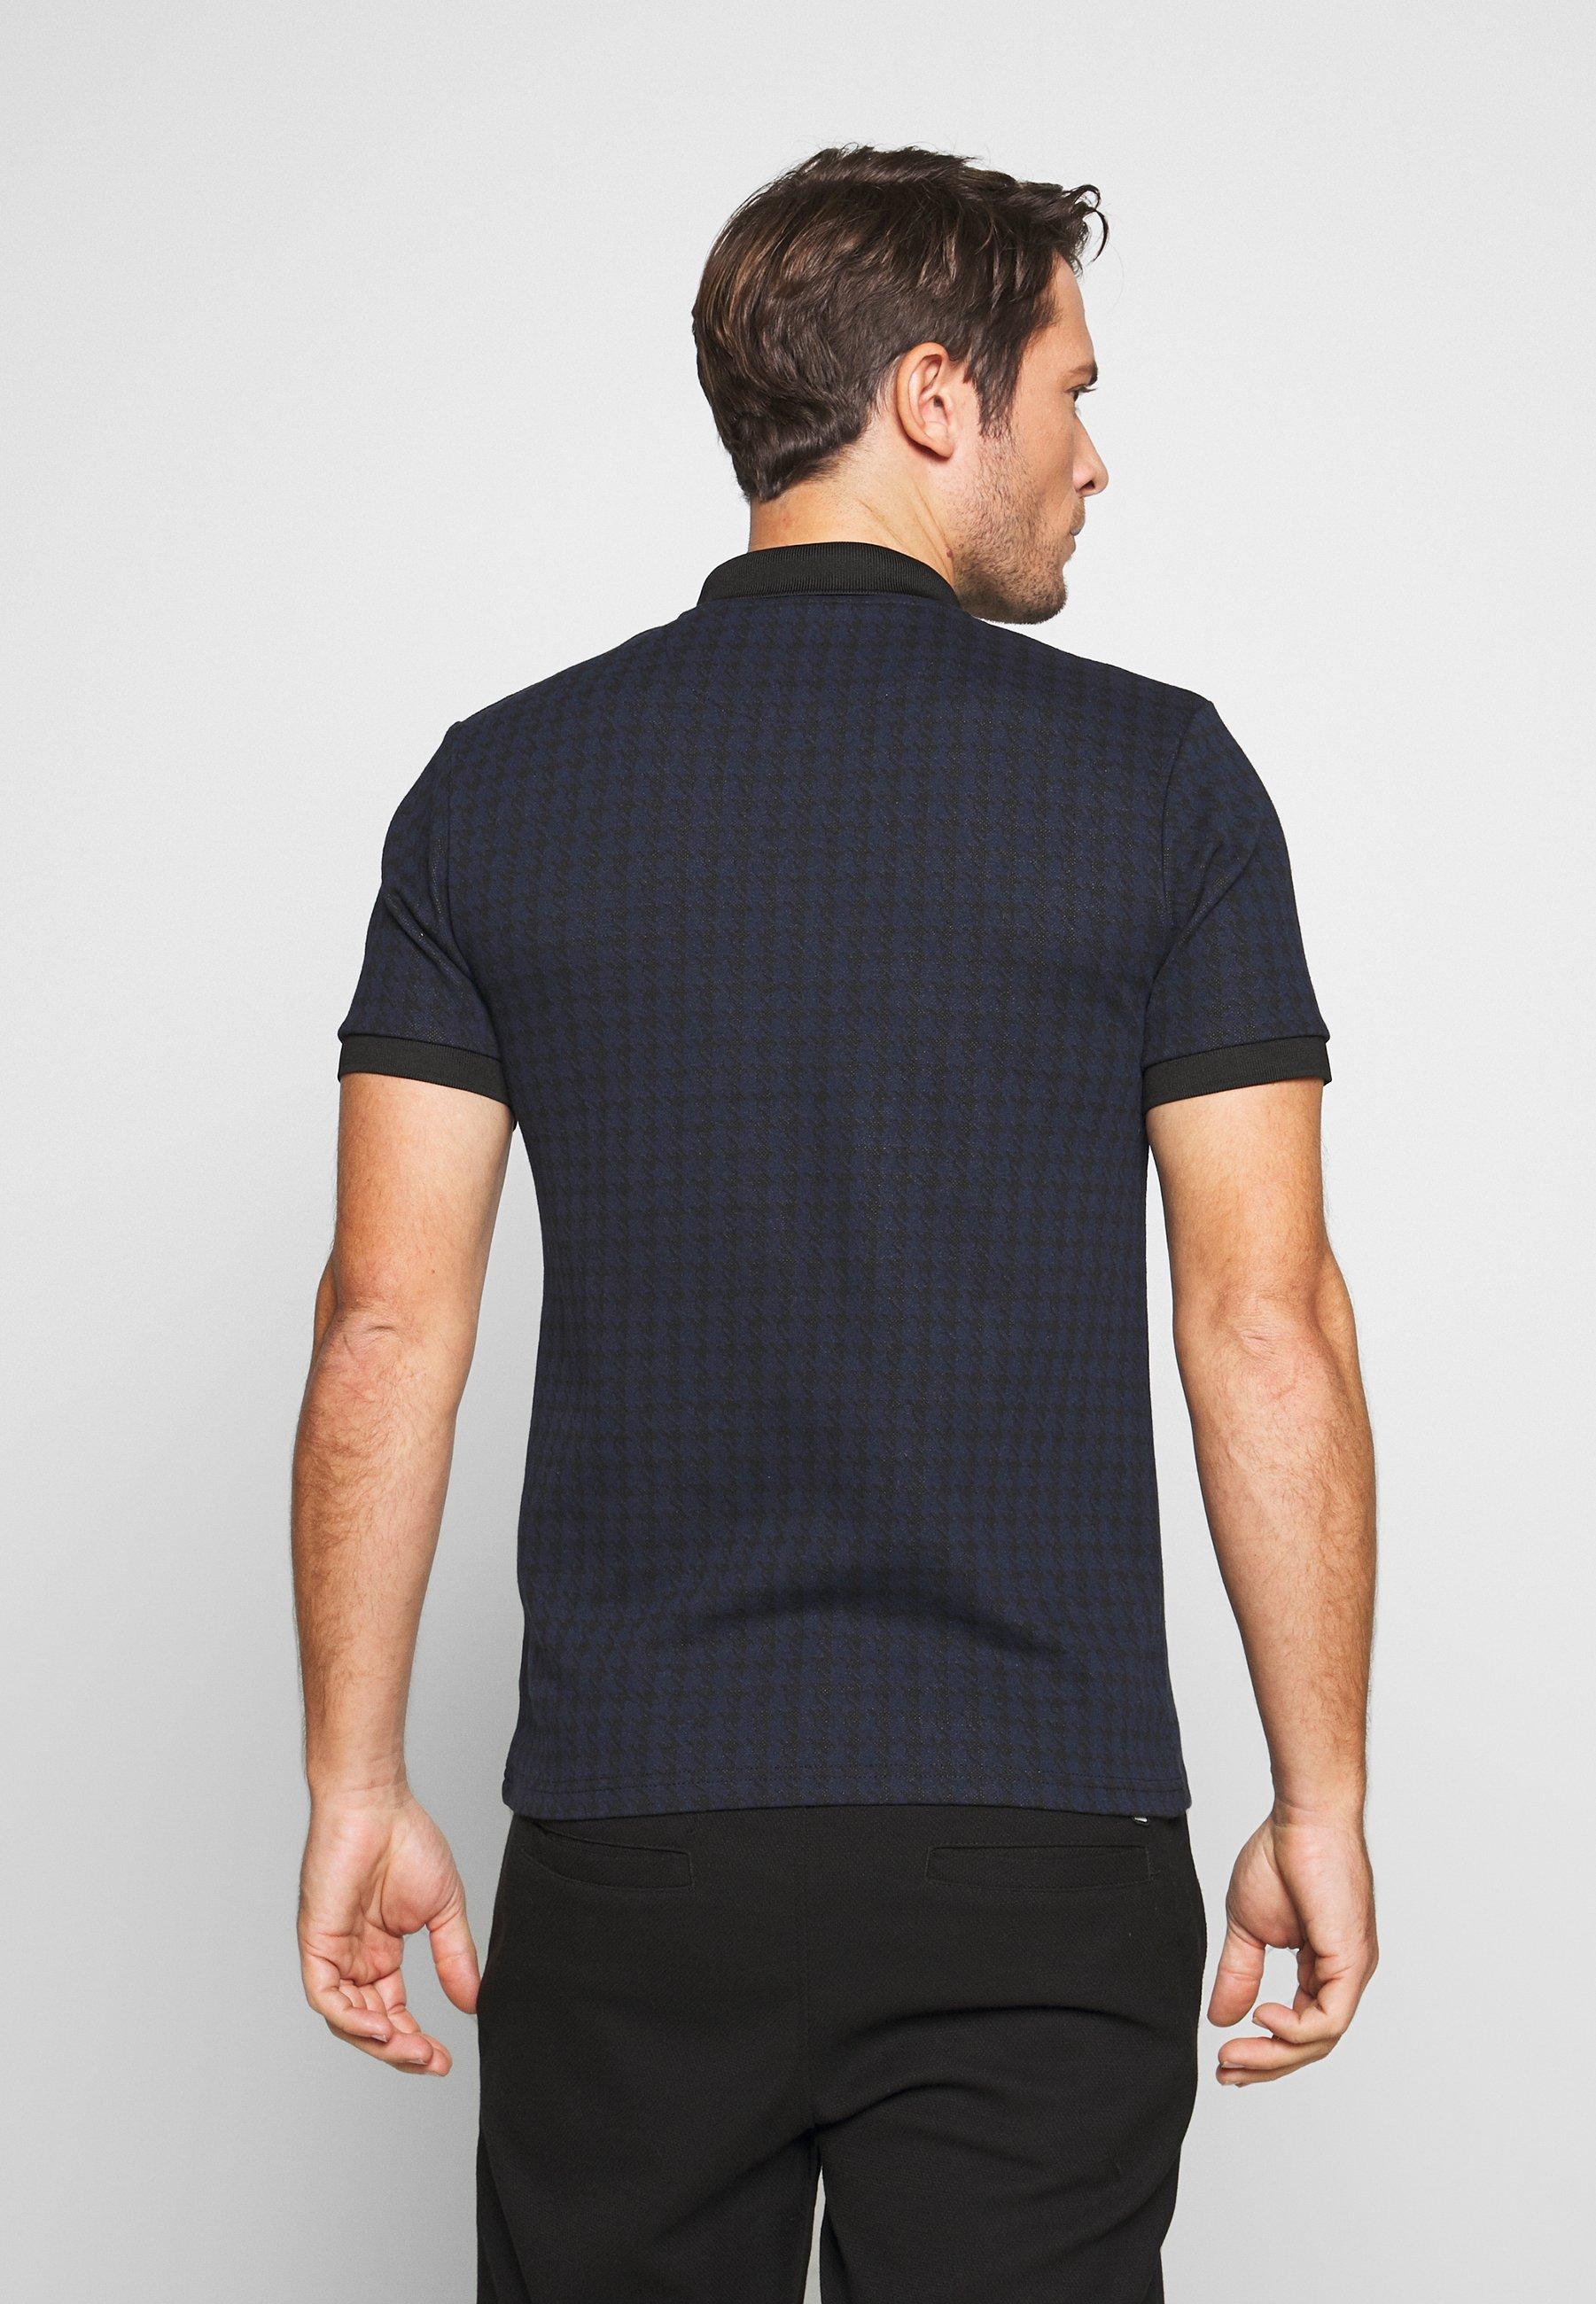 Burton Menswear London DOGTOOTH  - Koszulka polo - navy - Odzież męska Tani